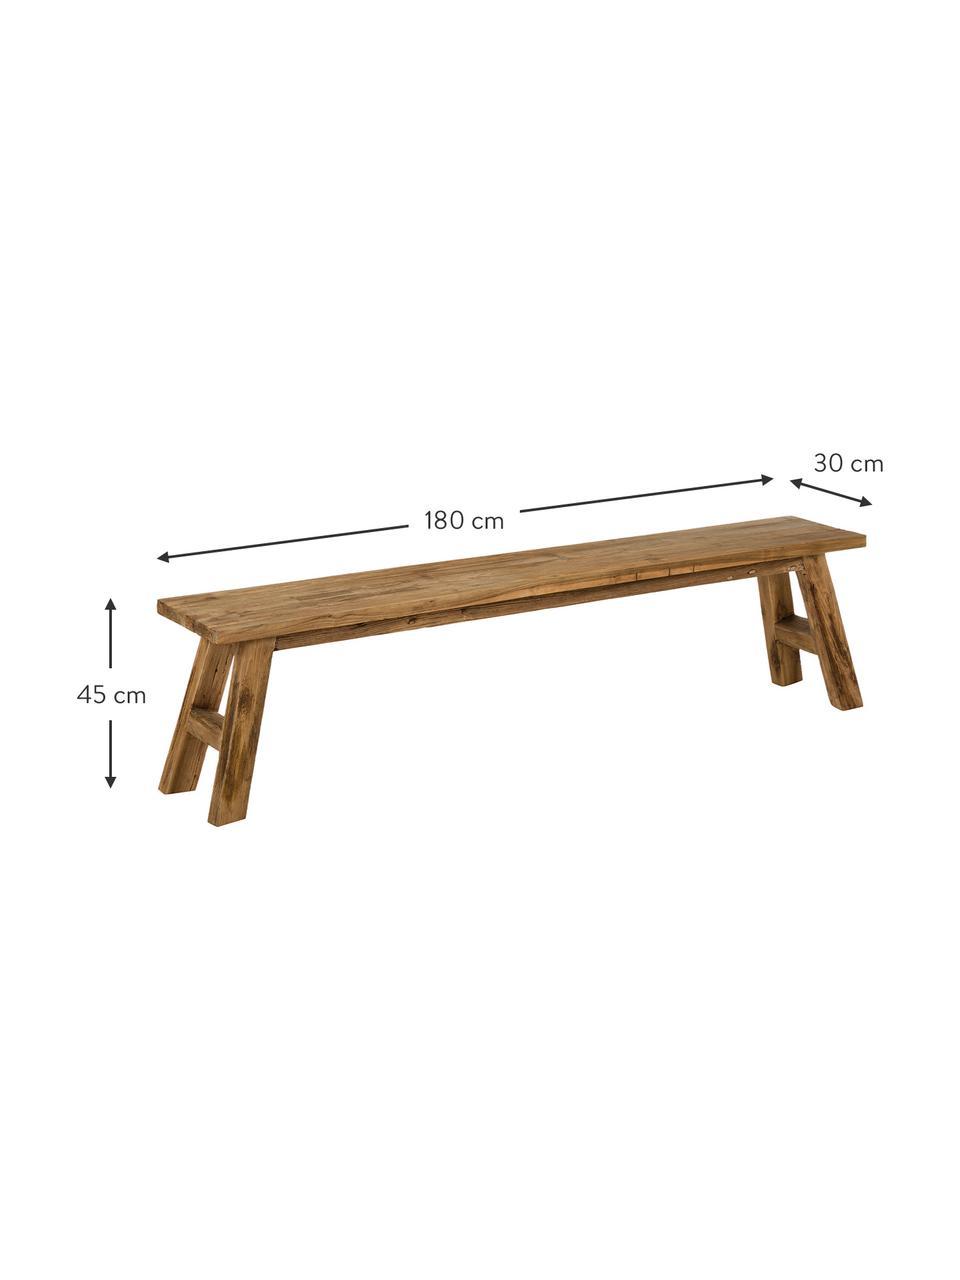 Panchina in legno di teak riciclato Lawas, Legno di teak, finitura naturale, Legno di teak, Larg. 180 x Alt. 45 cm